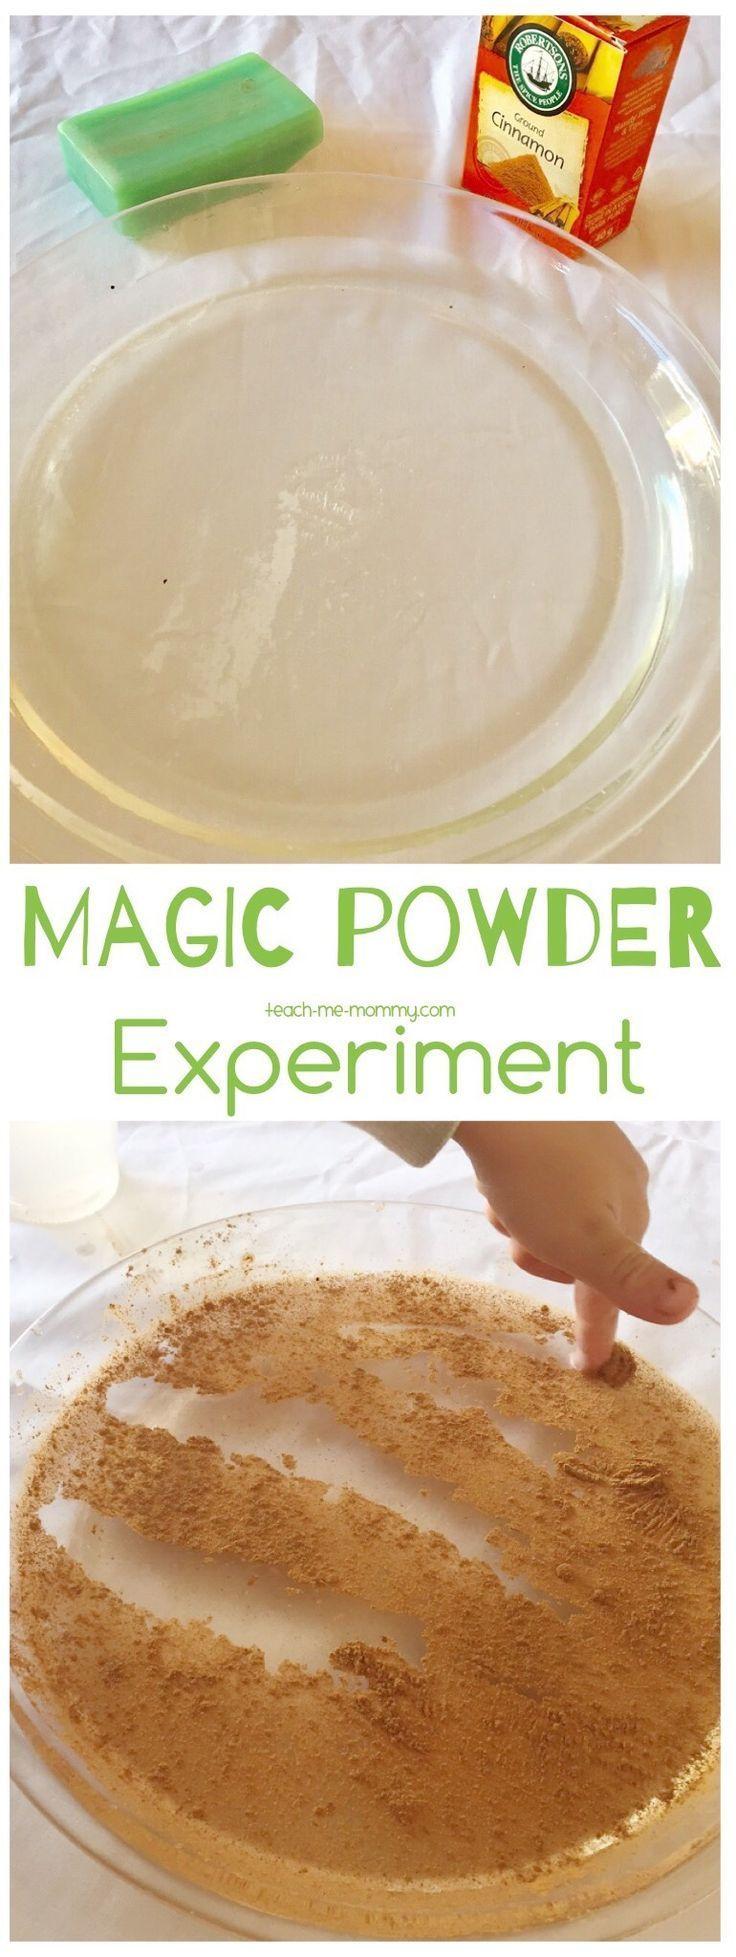 Magic Powder Experiment, fun way to teach surface tension!